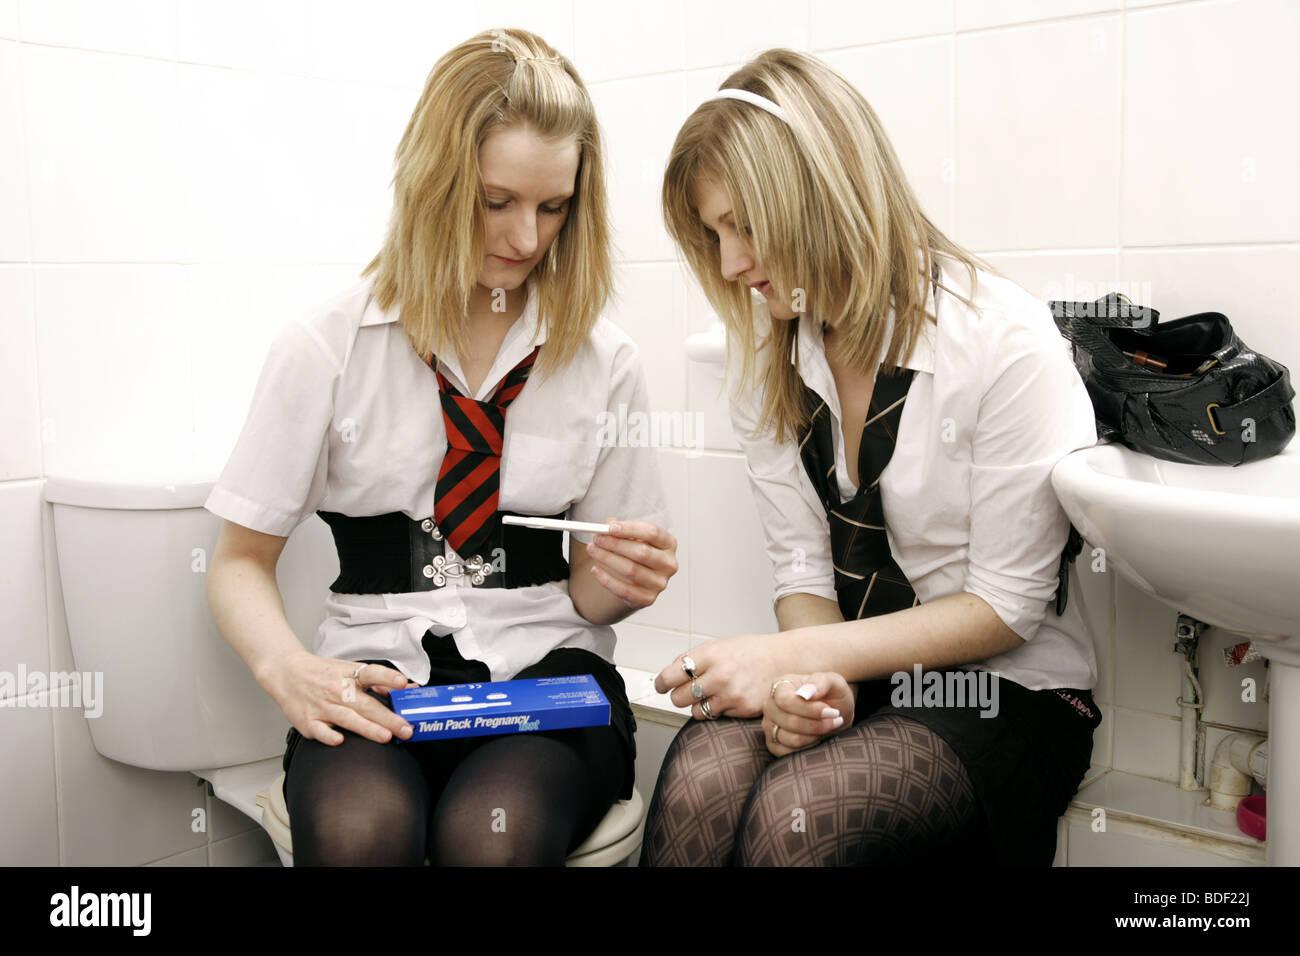 School Girls for Teenage Girls